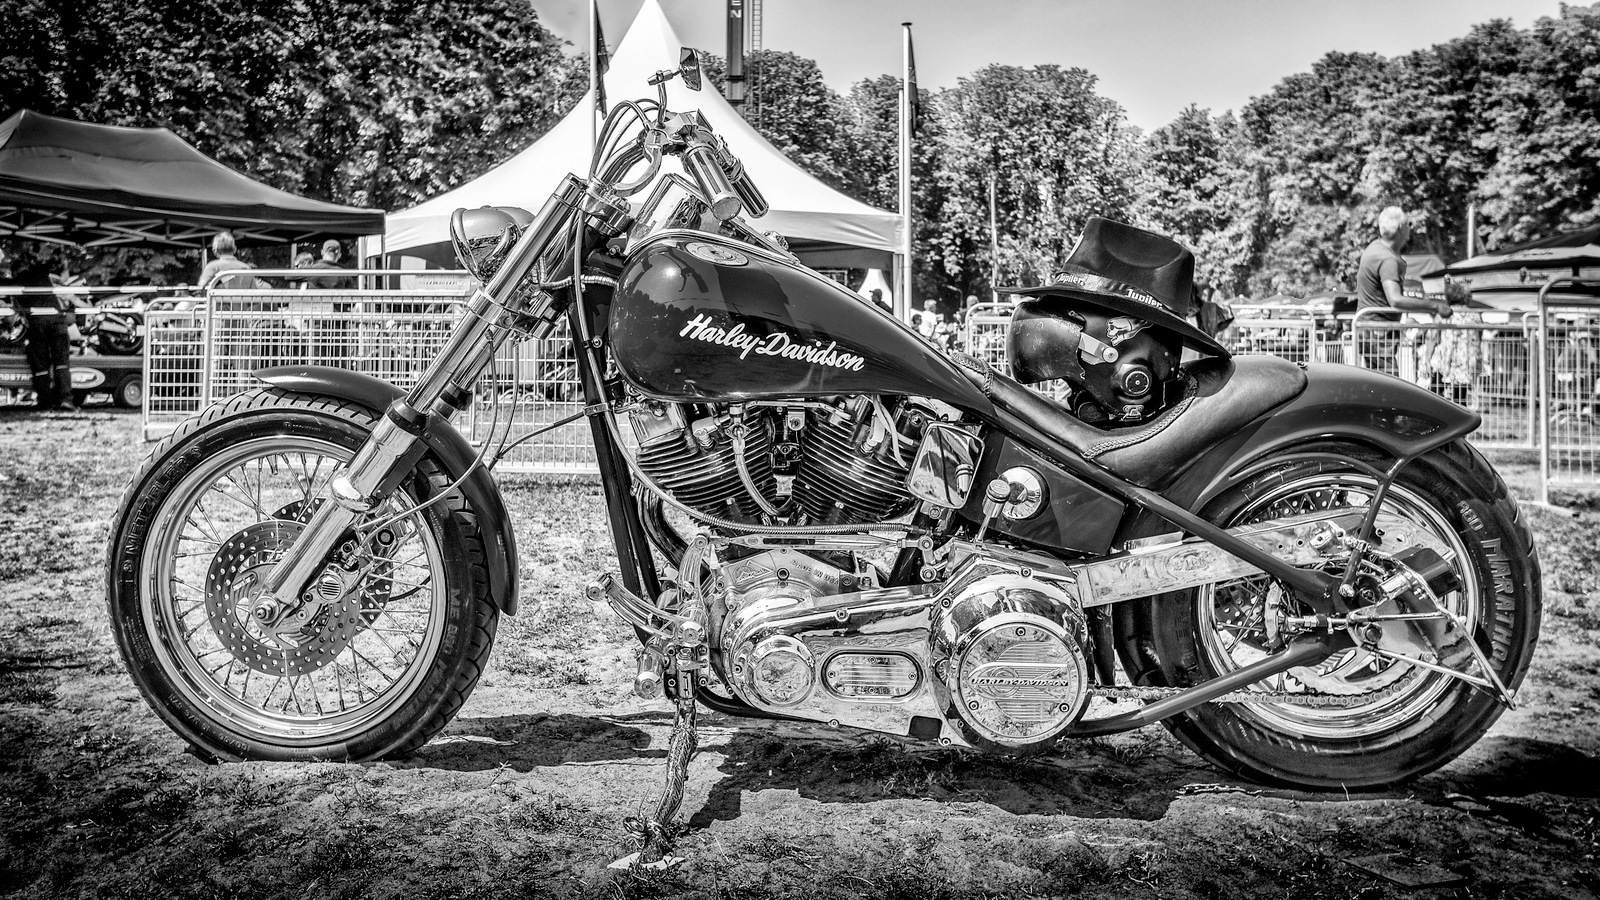 Harley Davidson by Pieter de Knijff Photography